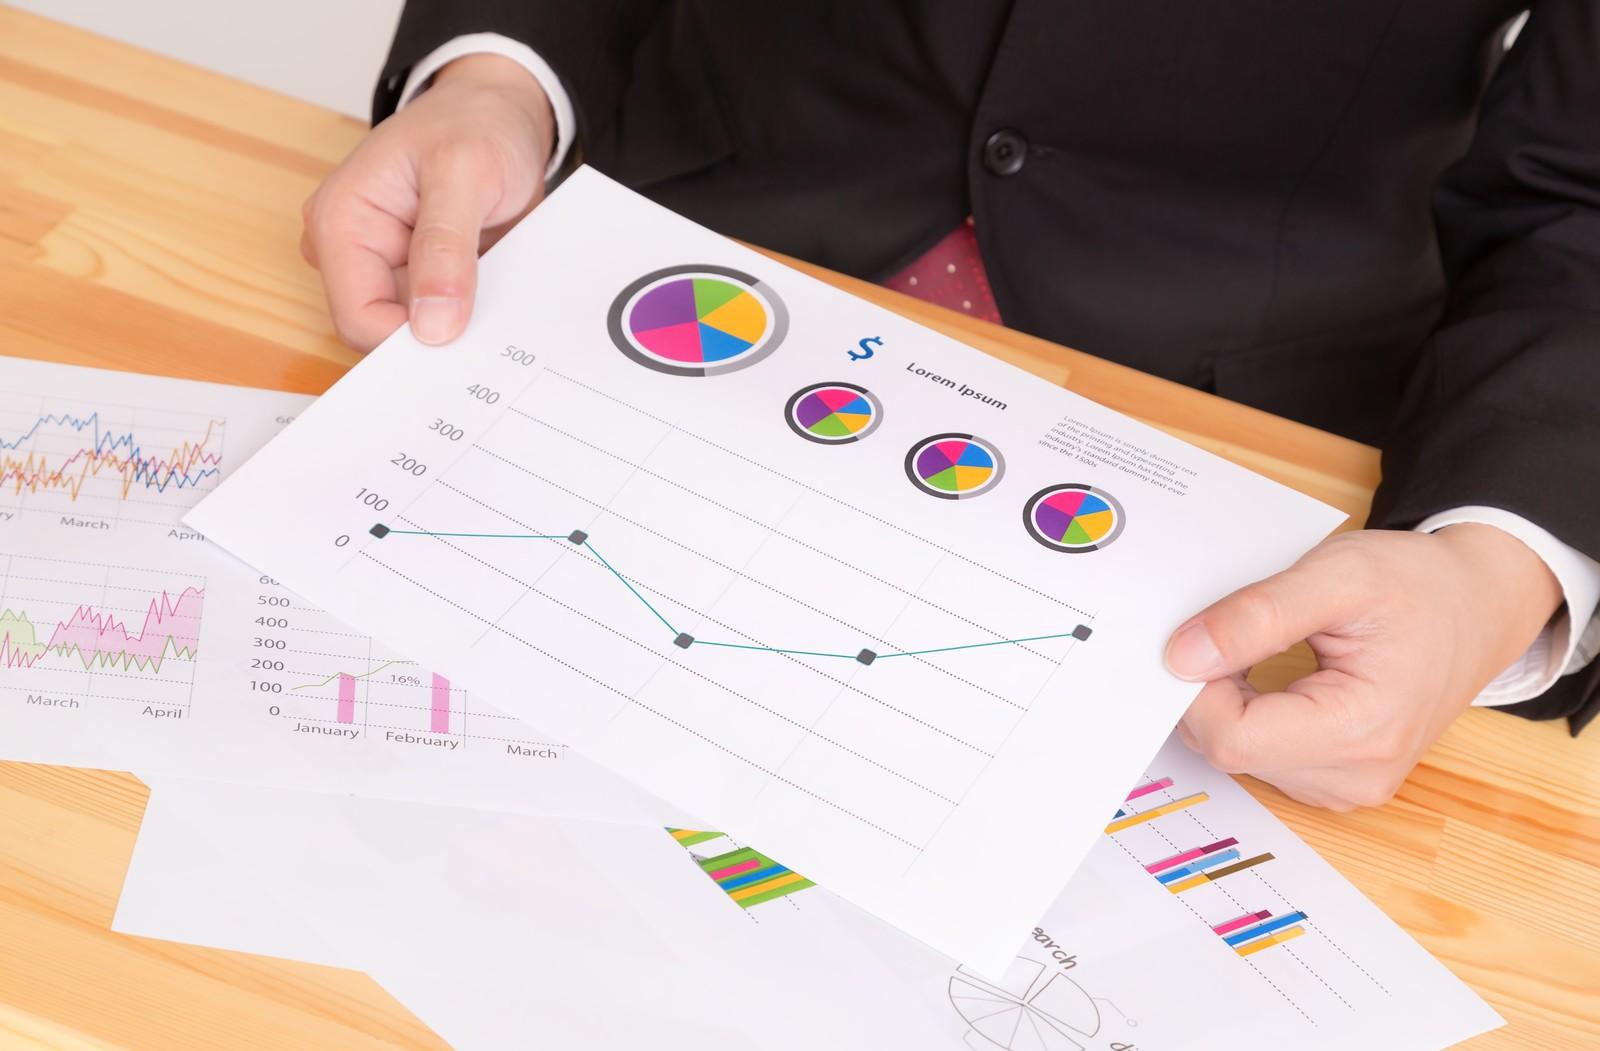 【IPO】SBI証券で初値売りをする方法を紹介します